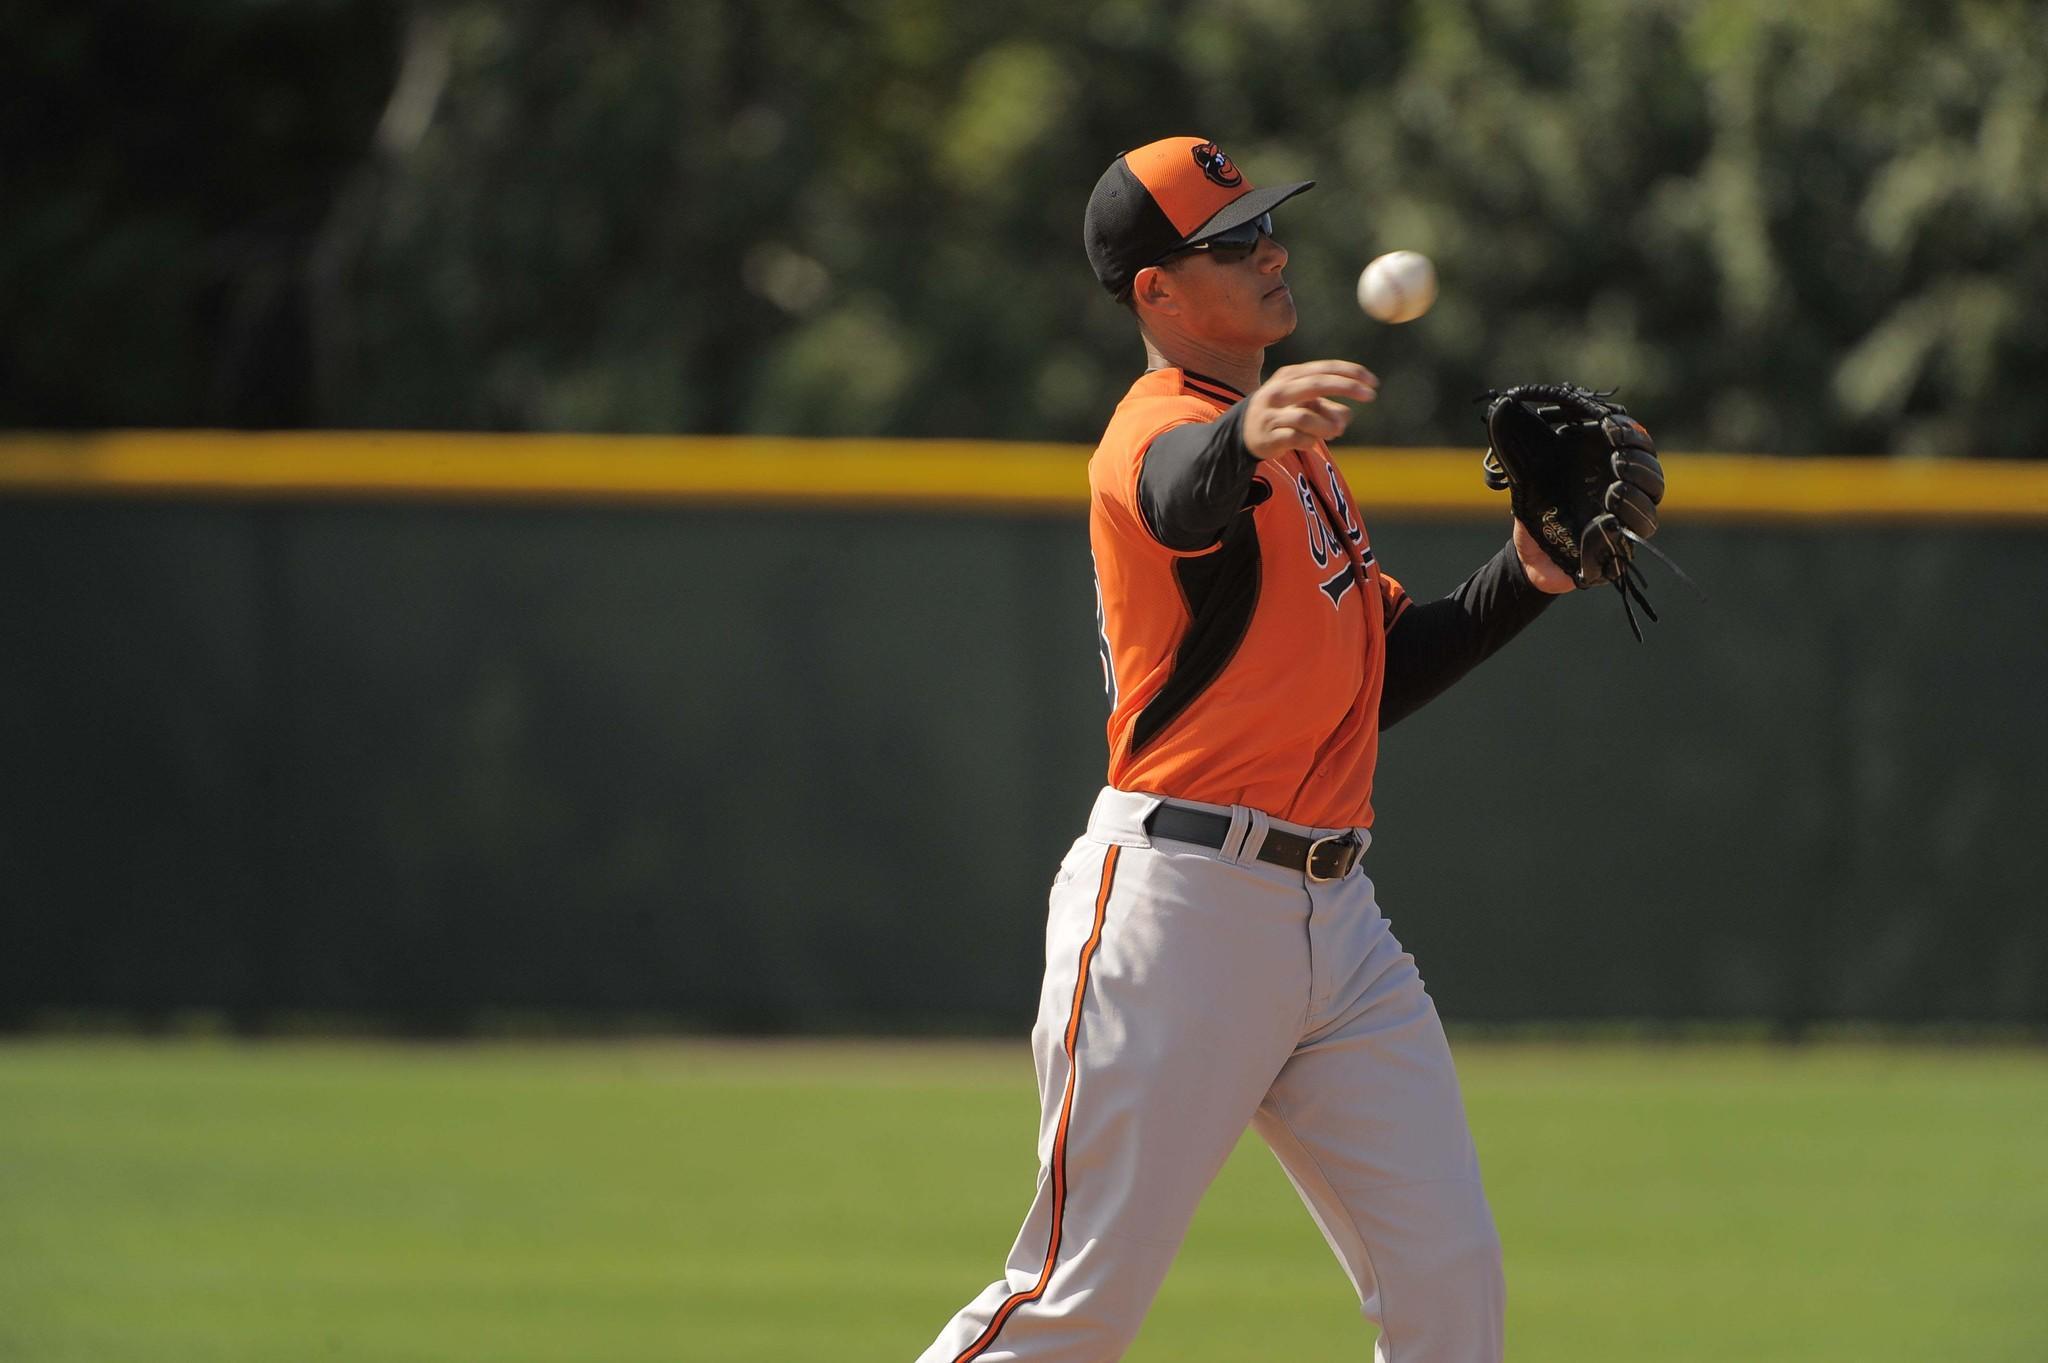 Baltimore Orioles third baseman Manny Machado throws the ball during fielding drills.